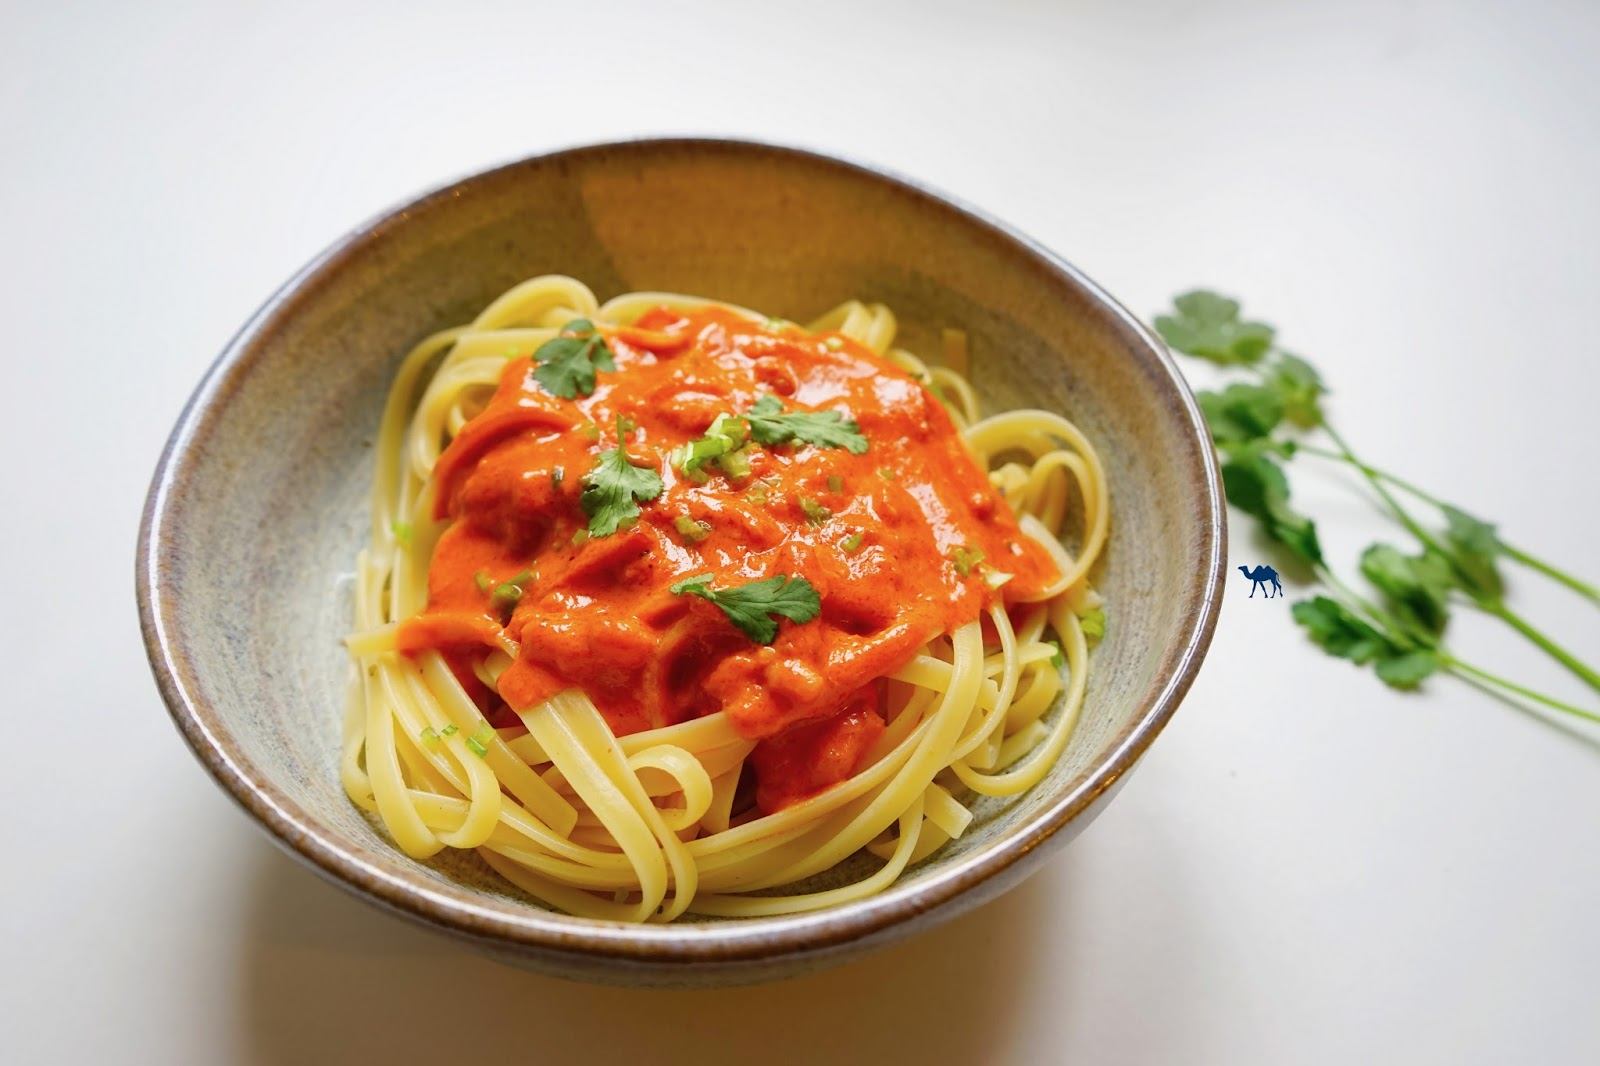 Le Chameau Bleu - Sauce CoCo Tomate Gingembre - Cuisine